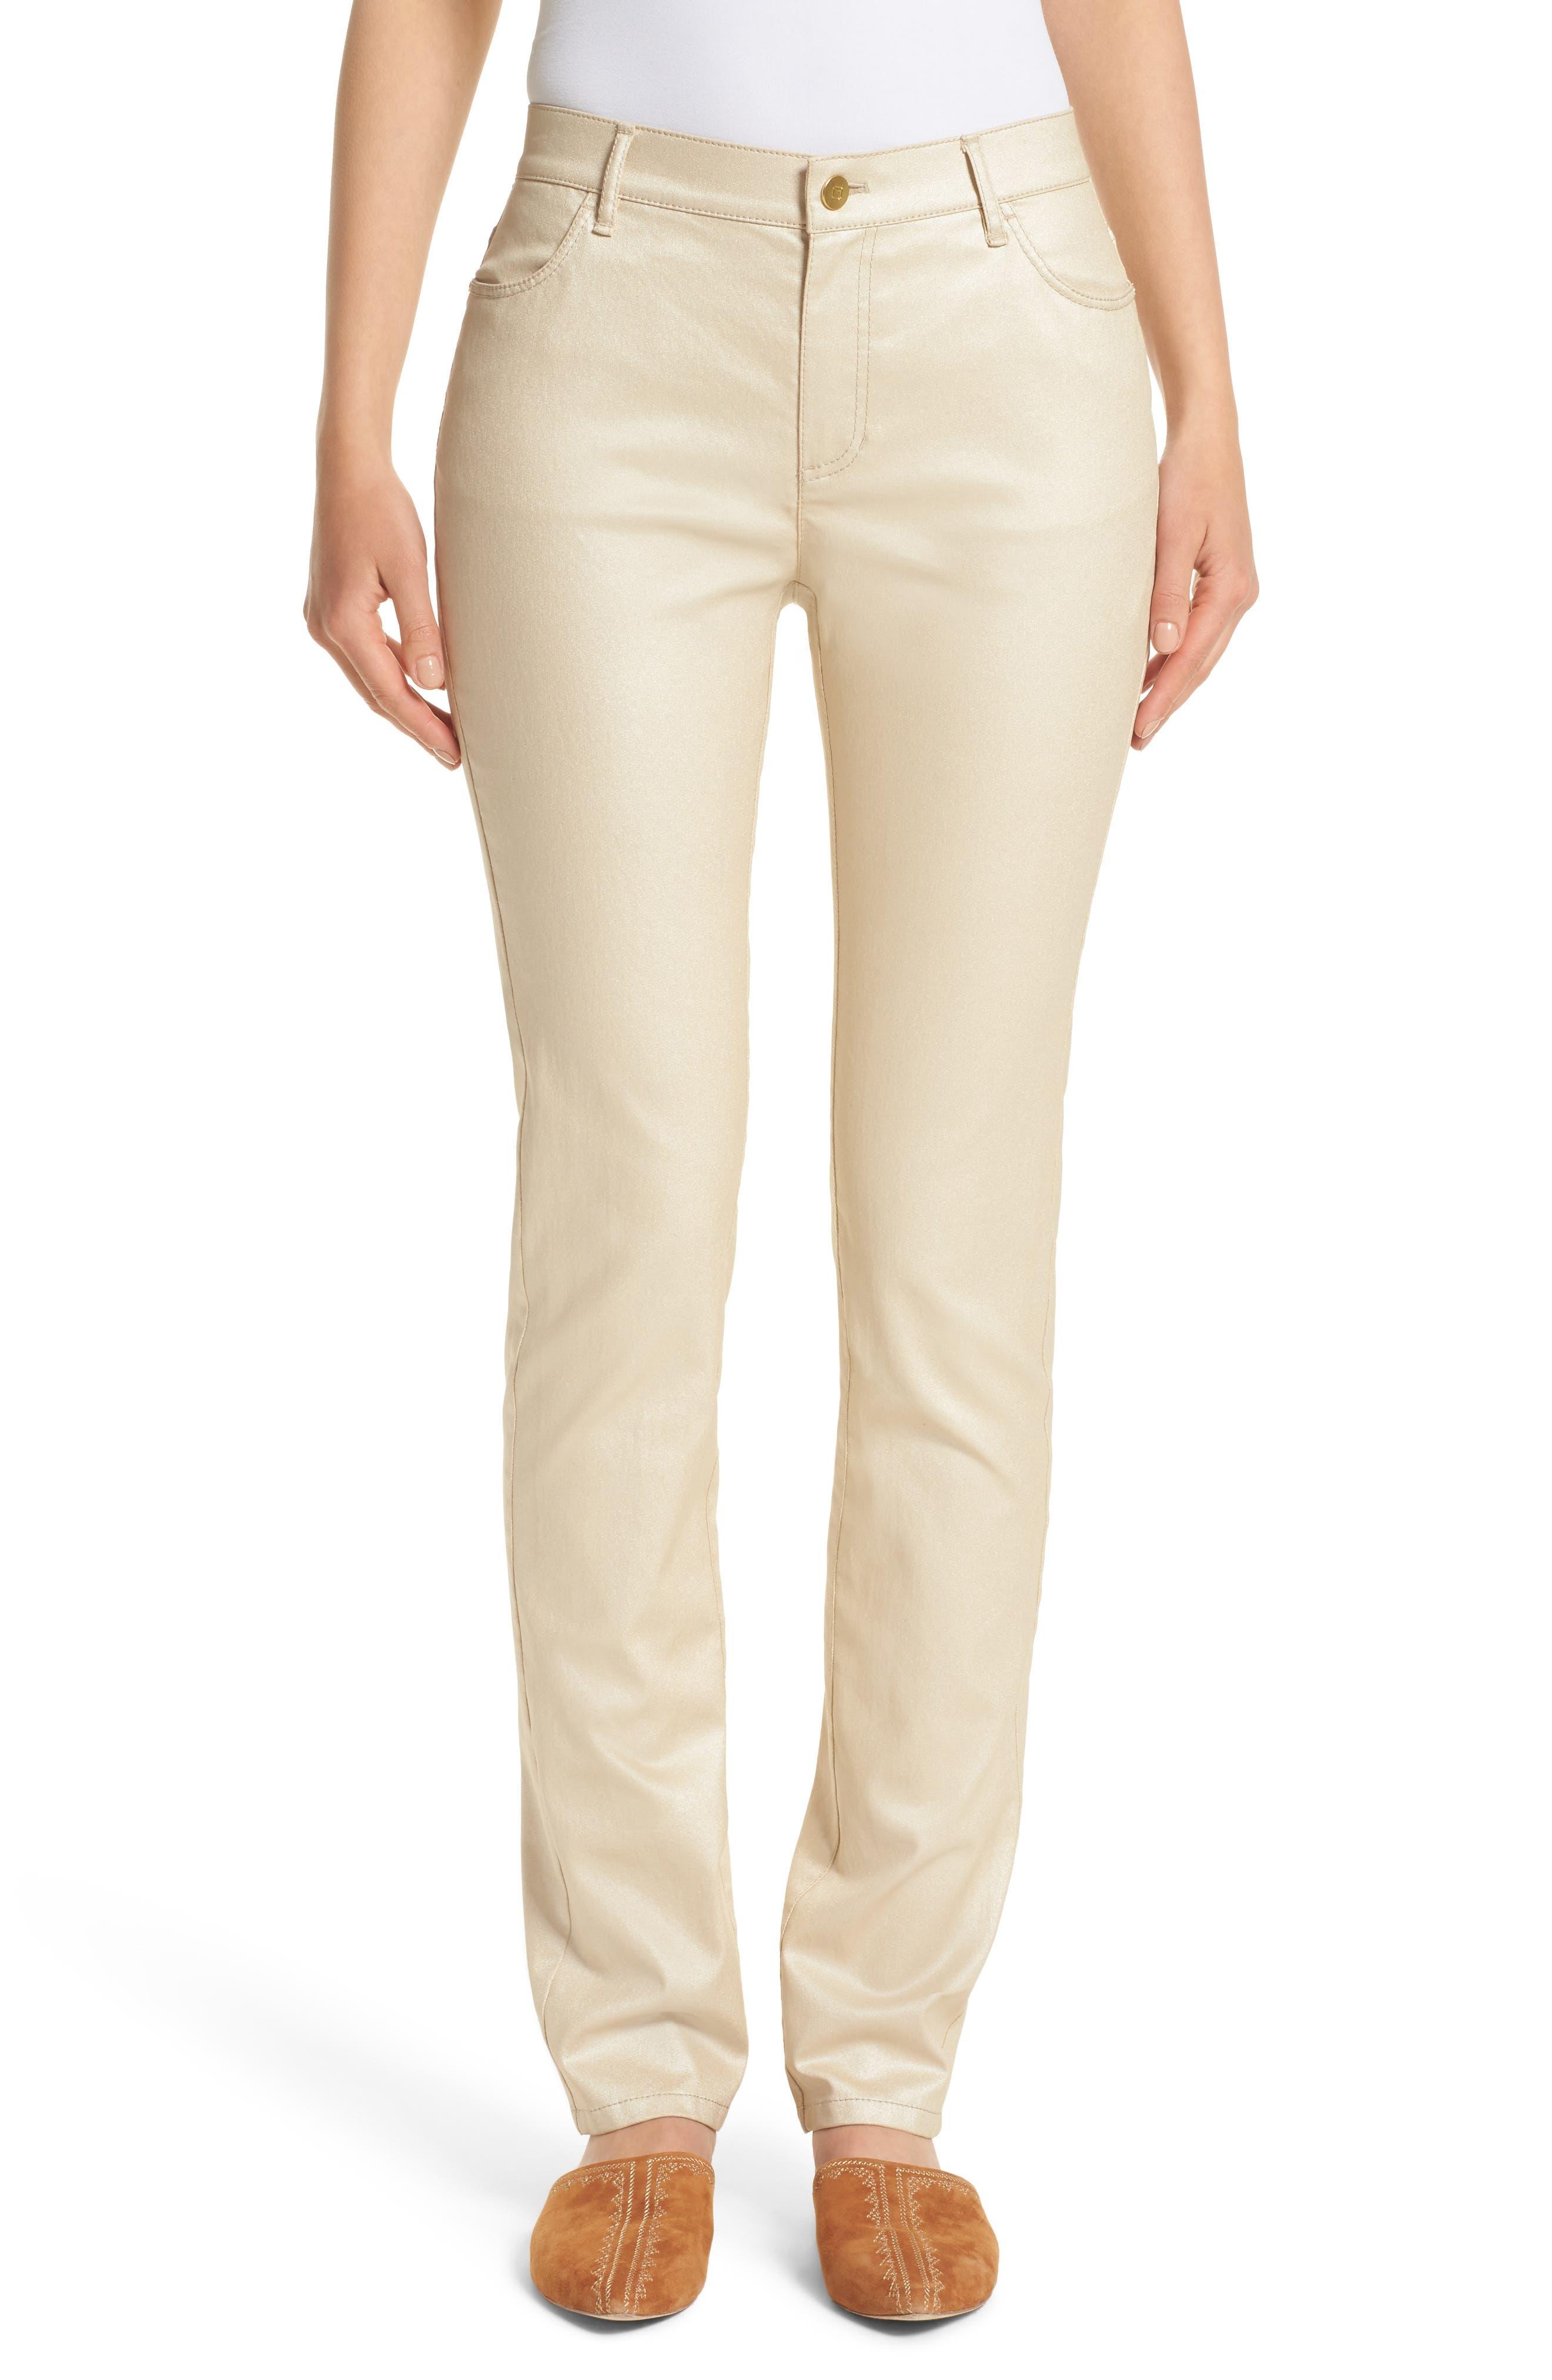 Alternate Image 1 Selected - Lafayette 148 New York Curvy Fit Skinny Jeans (Mason)